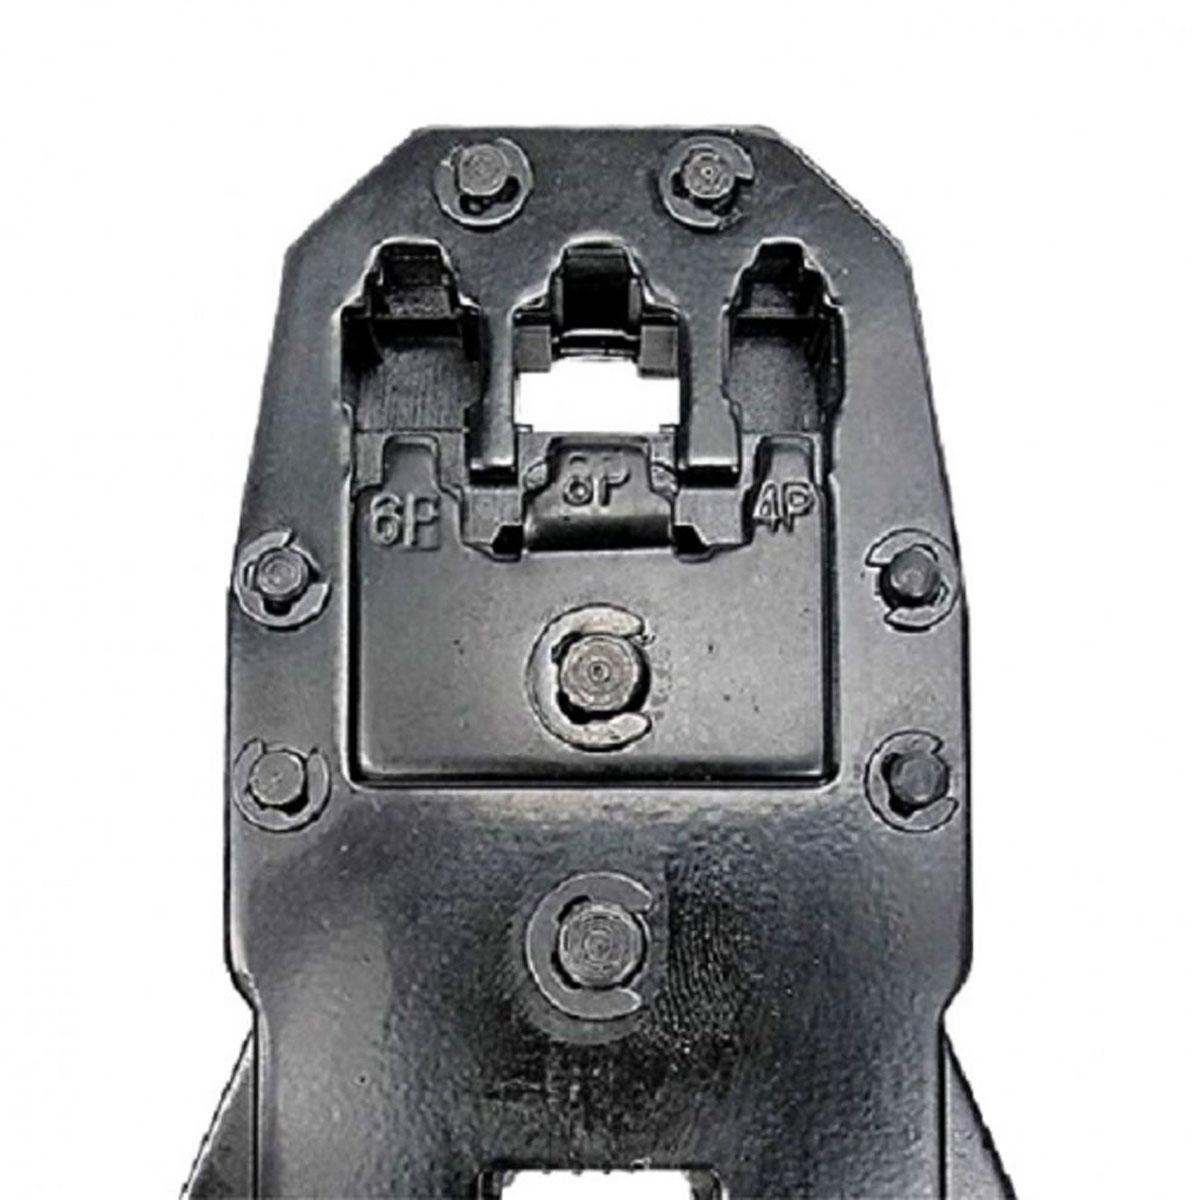 Alicate de Crimpar Conectores Rj11 Rj12 e Rj45 Hikari Hk-301